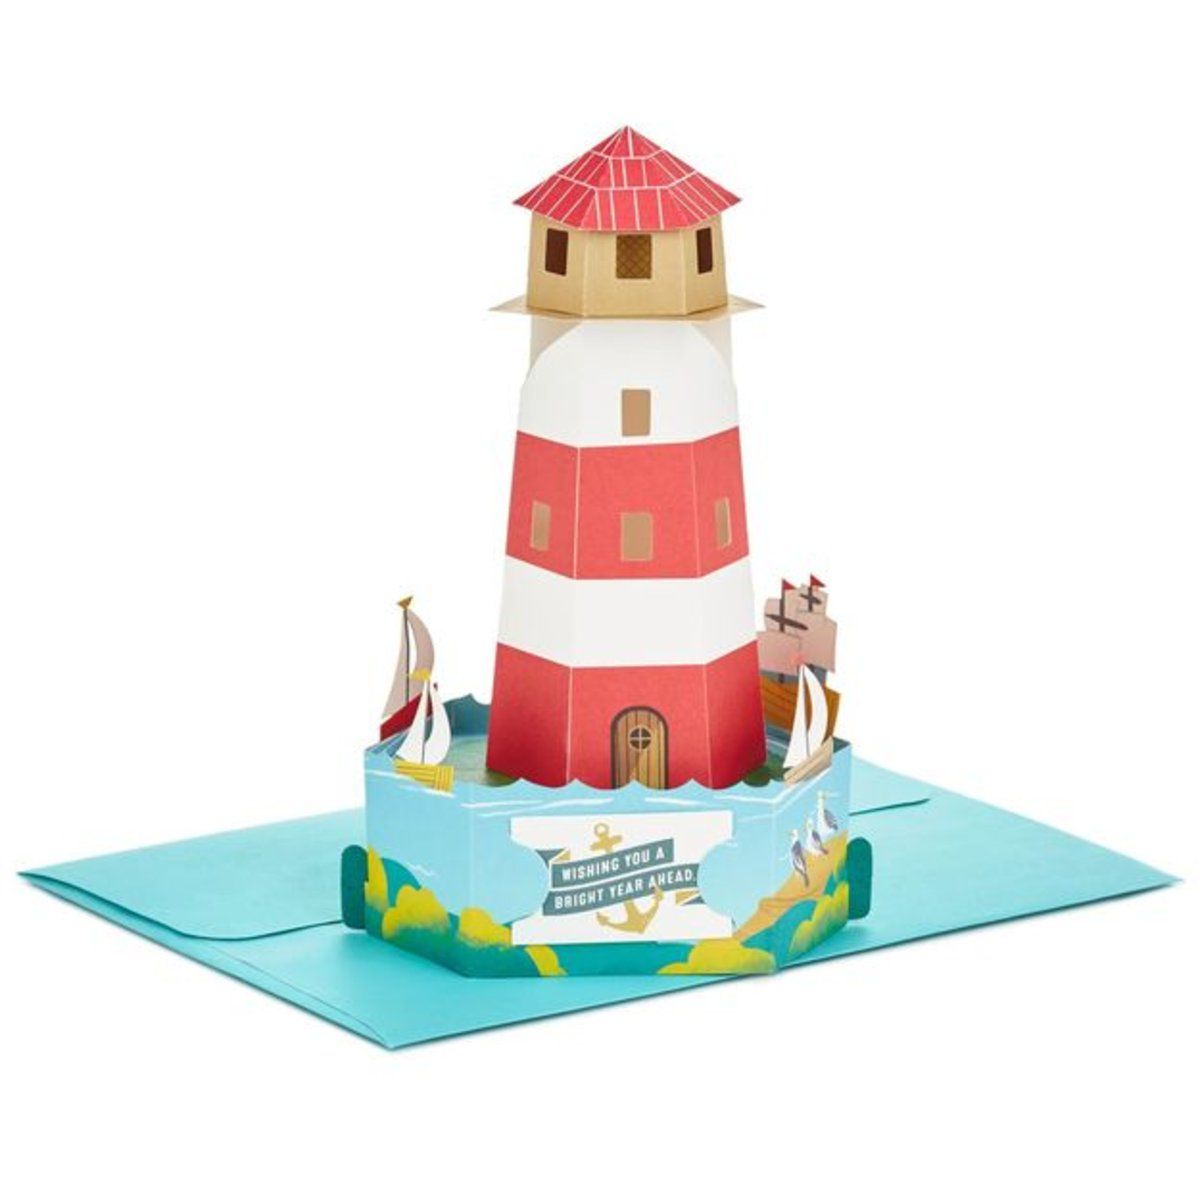 Hallmark Bright Wishes Lighthouse Pop Up Birthday Card